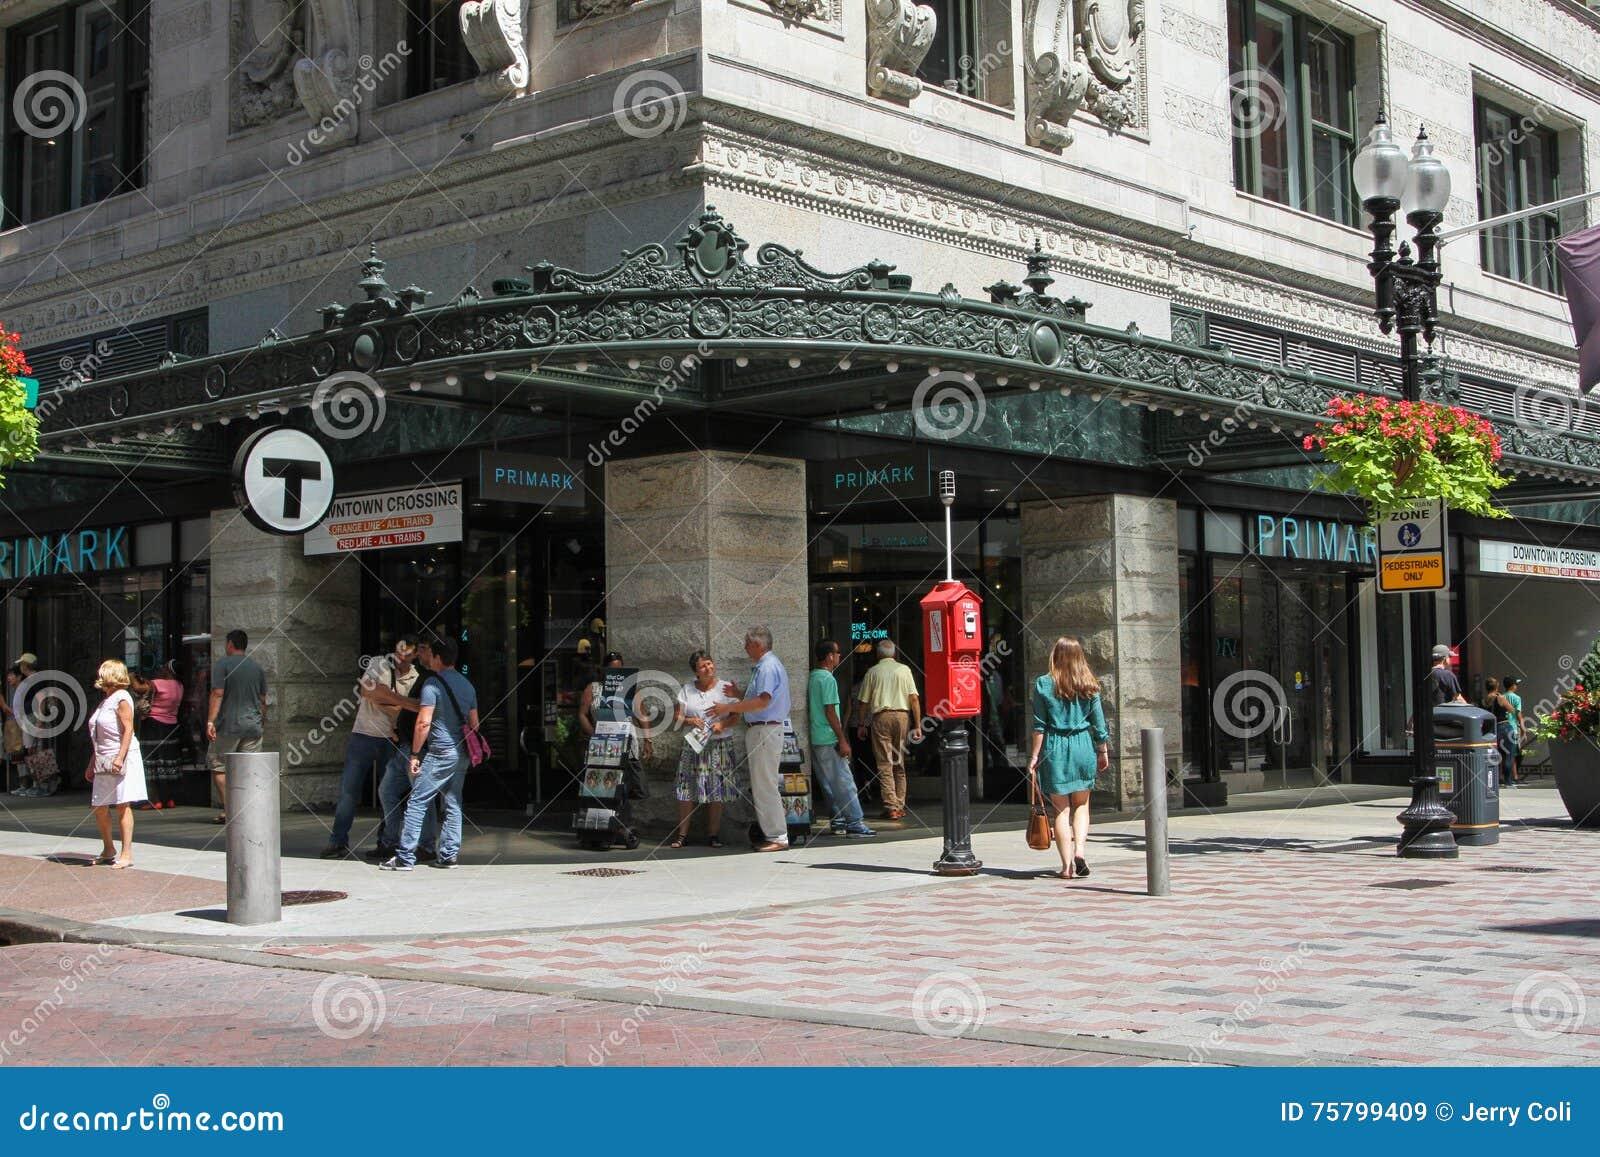 primark store downtown crossing boston ma editorial stock image image 75799409. Black Bedroom Furniture Sets. Home Design Ideas